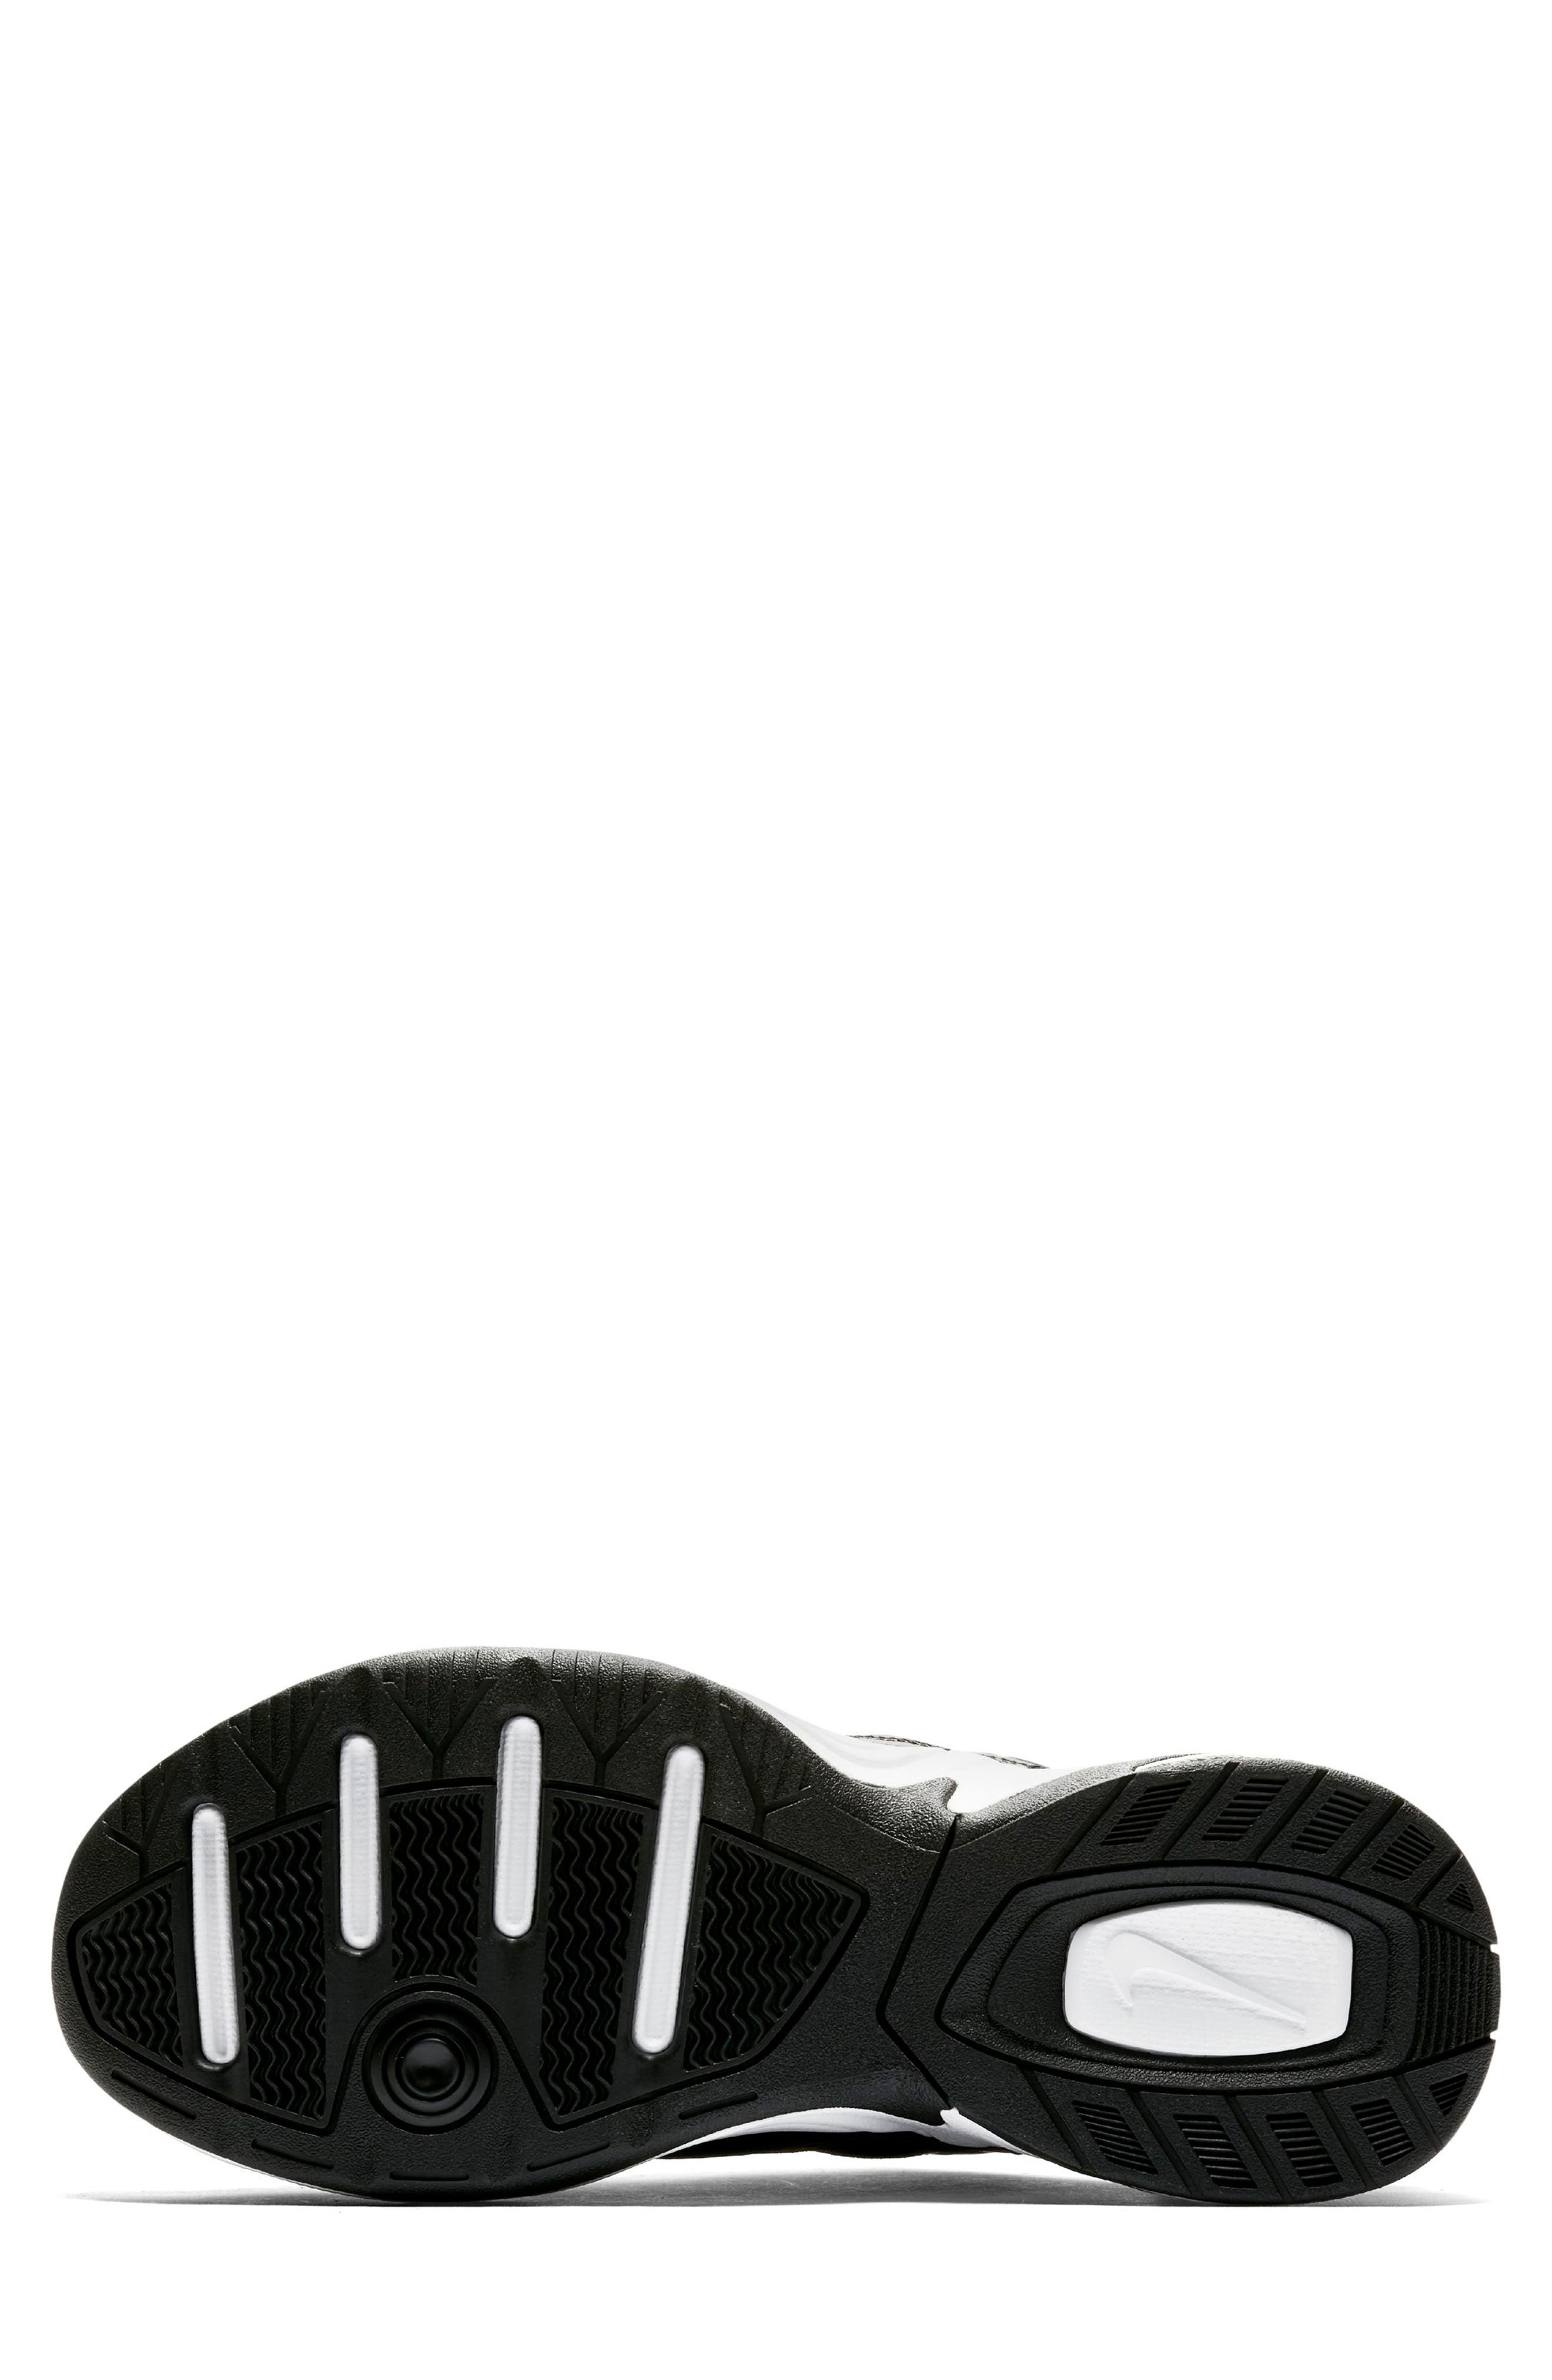 M2K Tekno Sneaker,                             Alternate thumbnail 5, color,                             BLACK/ OFF WHITE/ OBSIDIAN